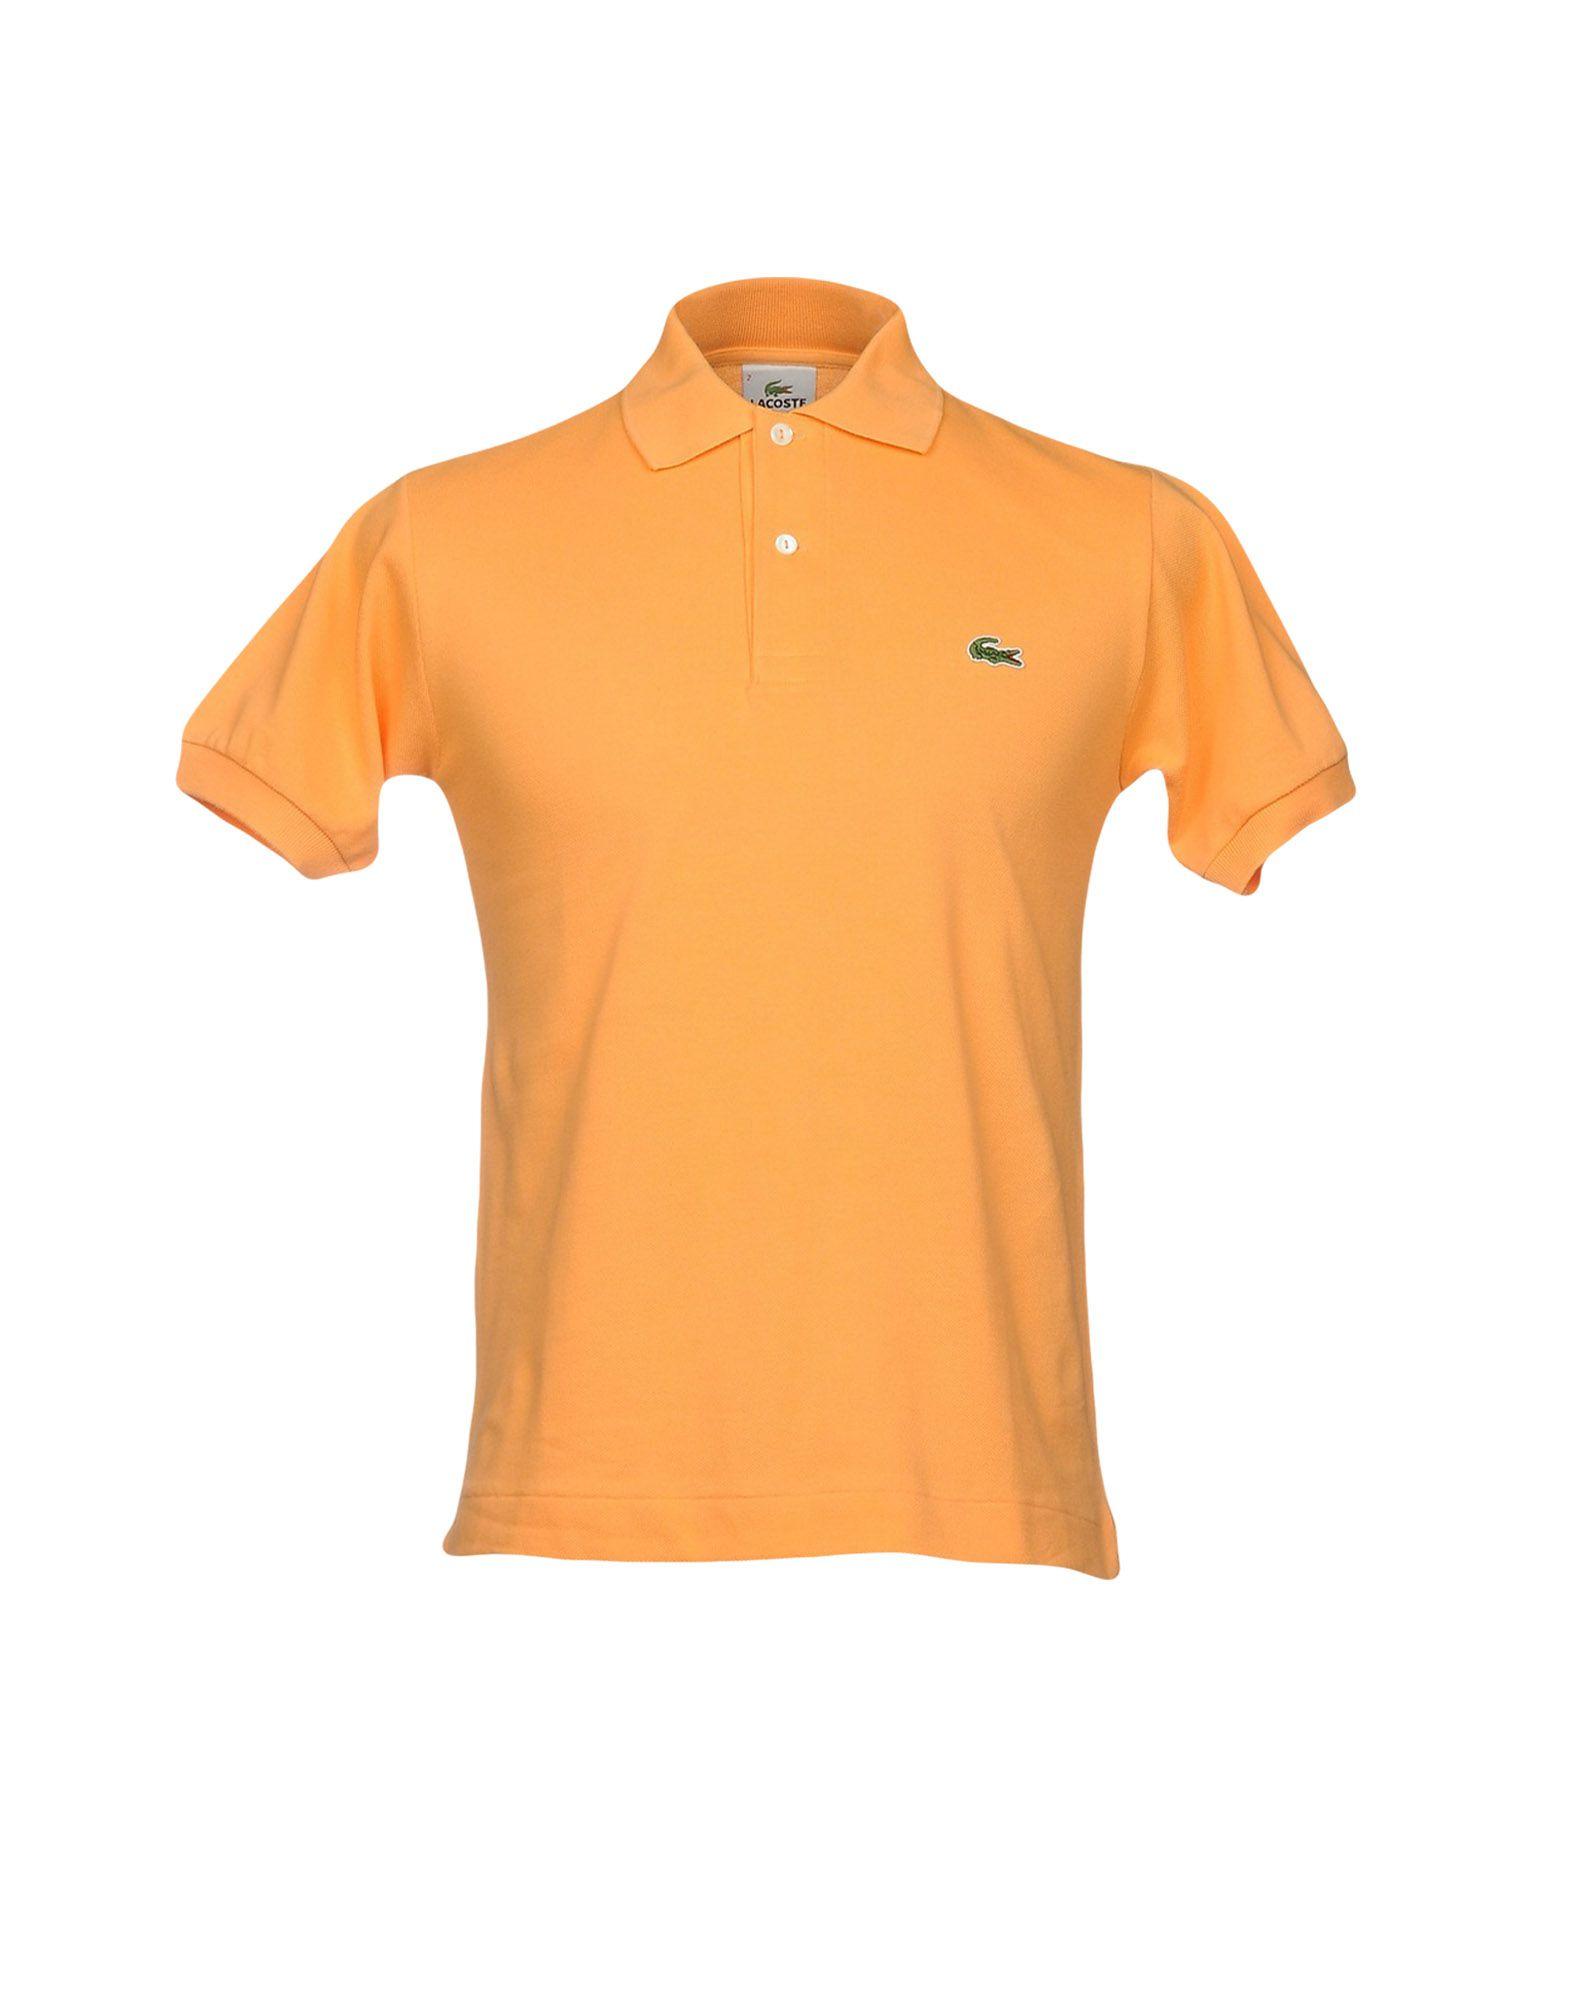 877c0f55d Lacoste Polo Shirt - Men Lacoste Polo Shirts online on YOOX Estonia -  12138197RB